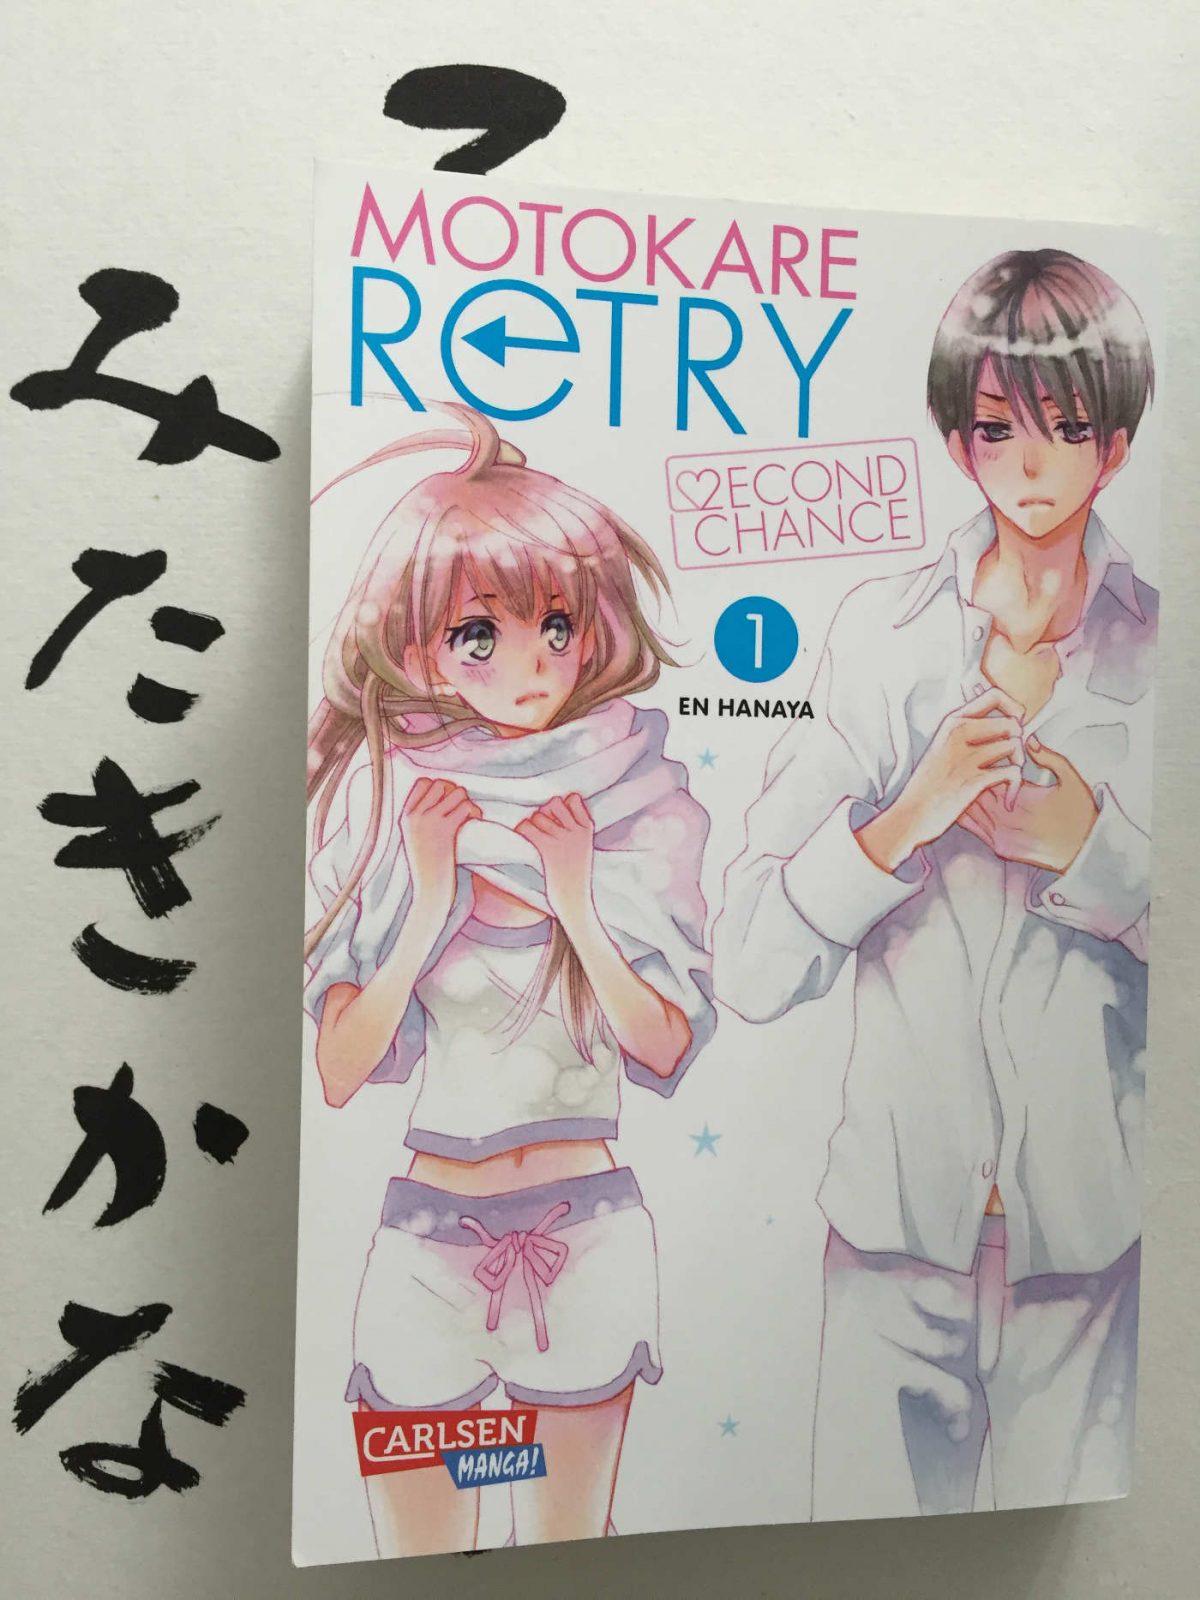 En Hanaya Motokare Retry Second Chance 1 Cover En Hanaya Motokare Retry Second Chance 1 Manga empfehlung jugendliche buchtipp Jugendbuchblog Brigitte Wallinger